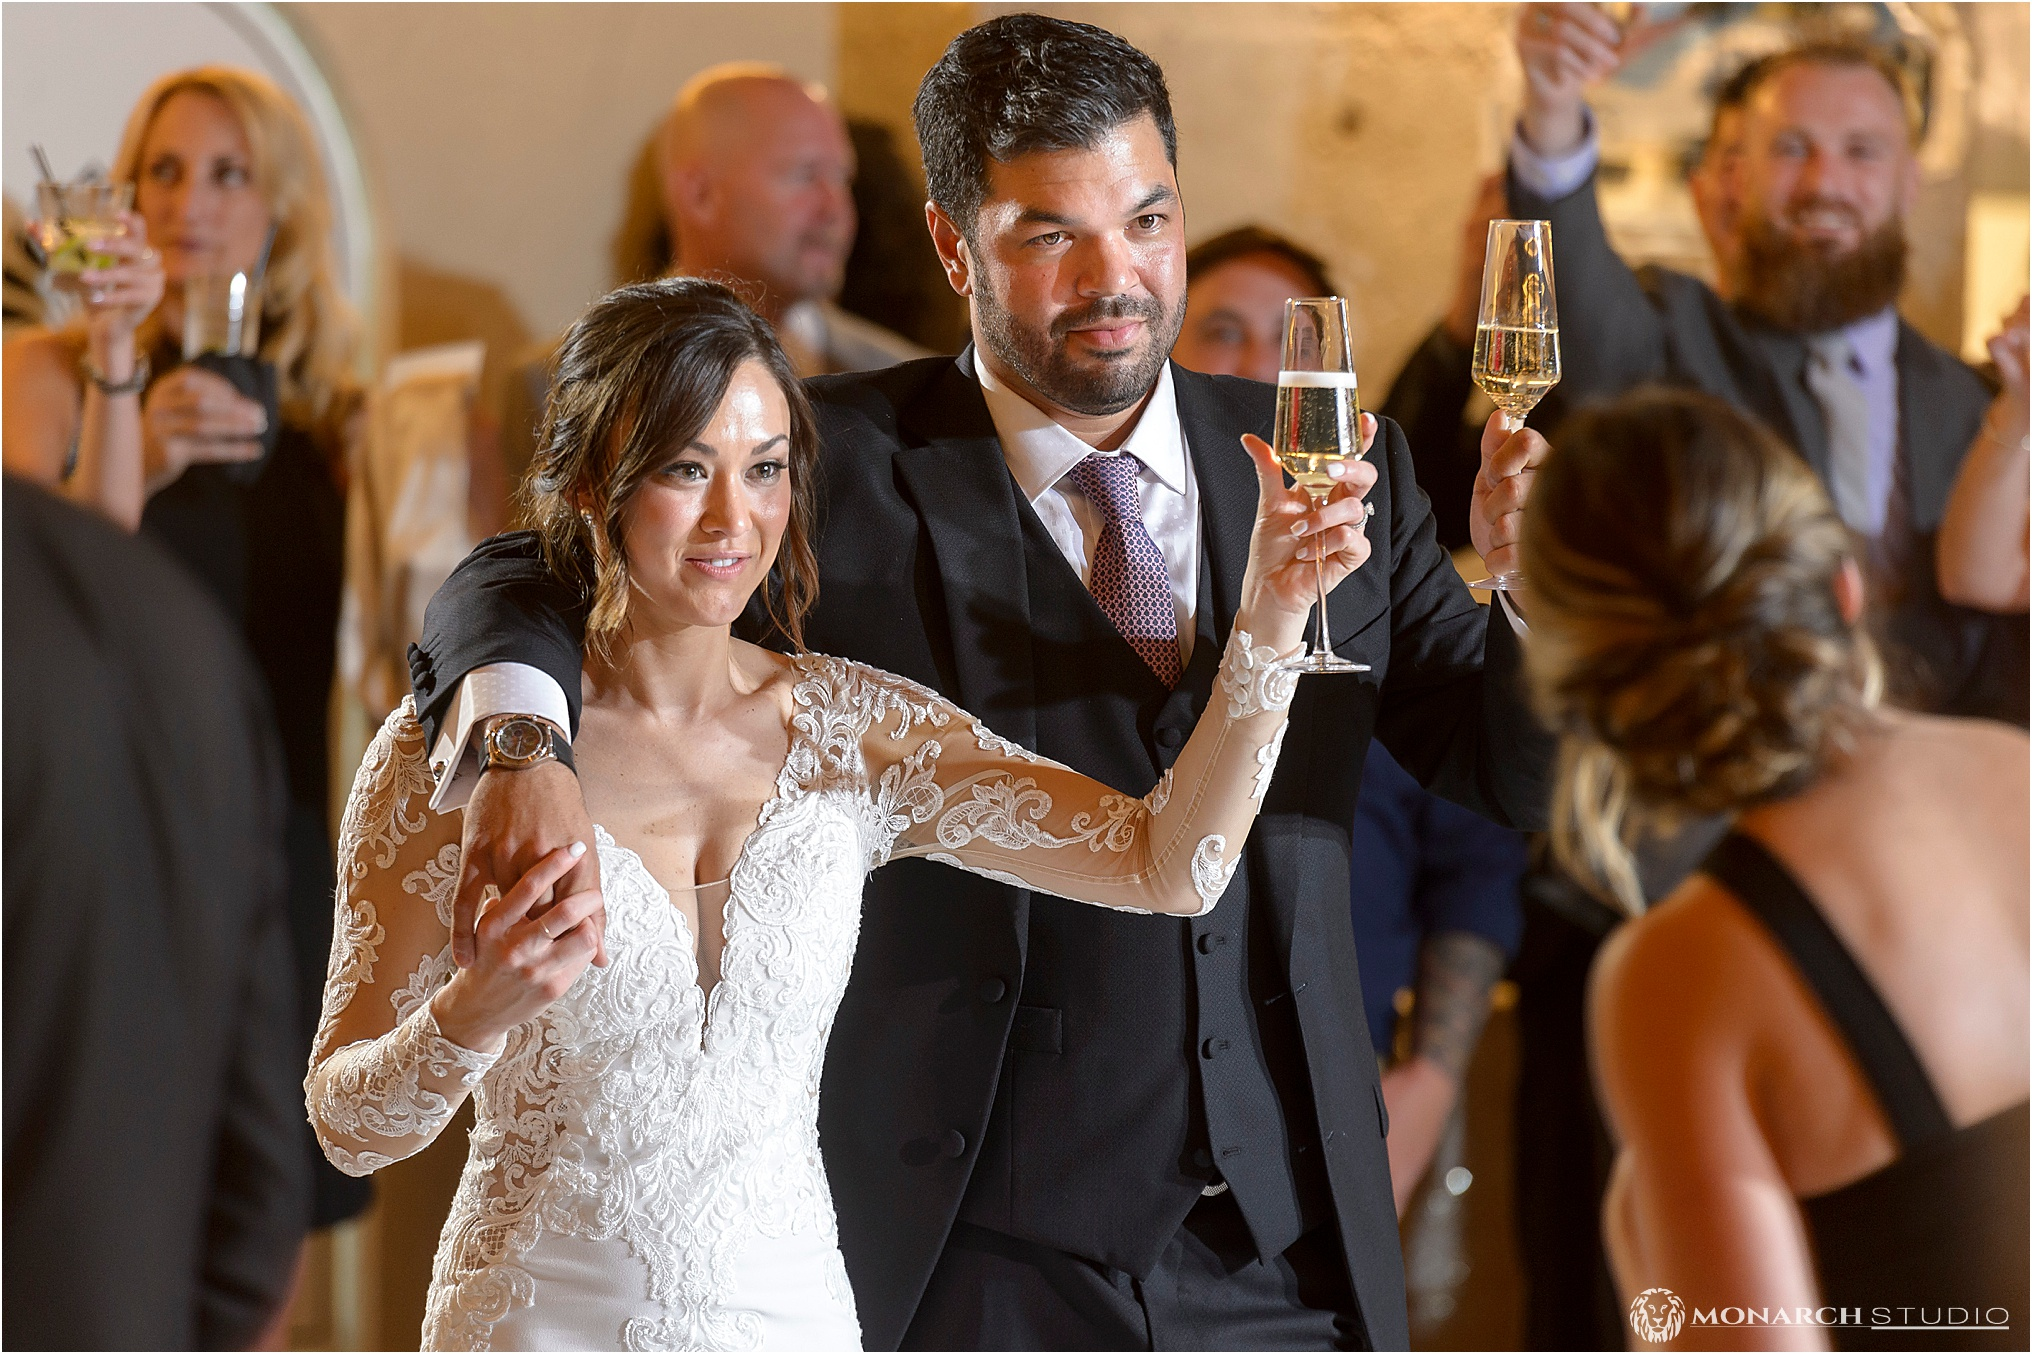 st-augustine-high-end-wedding-photographers-136.jpg